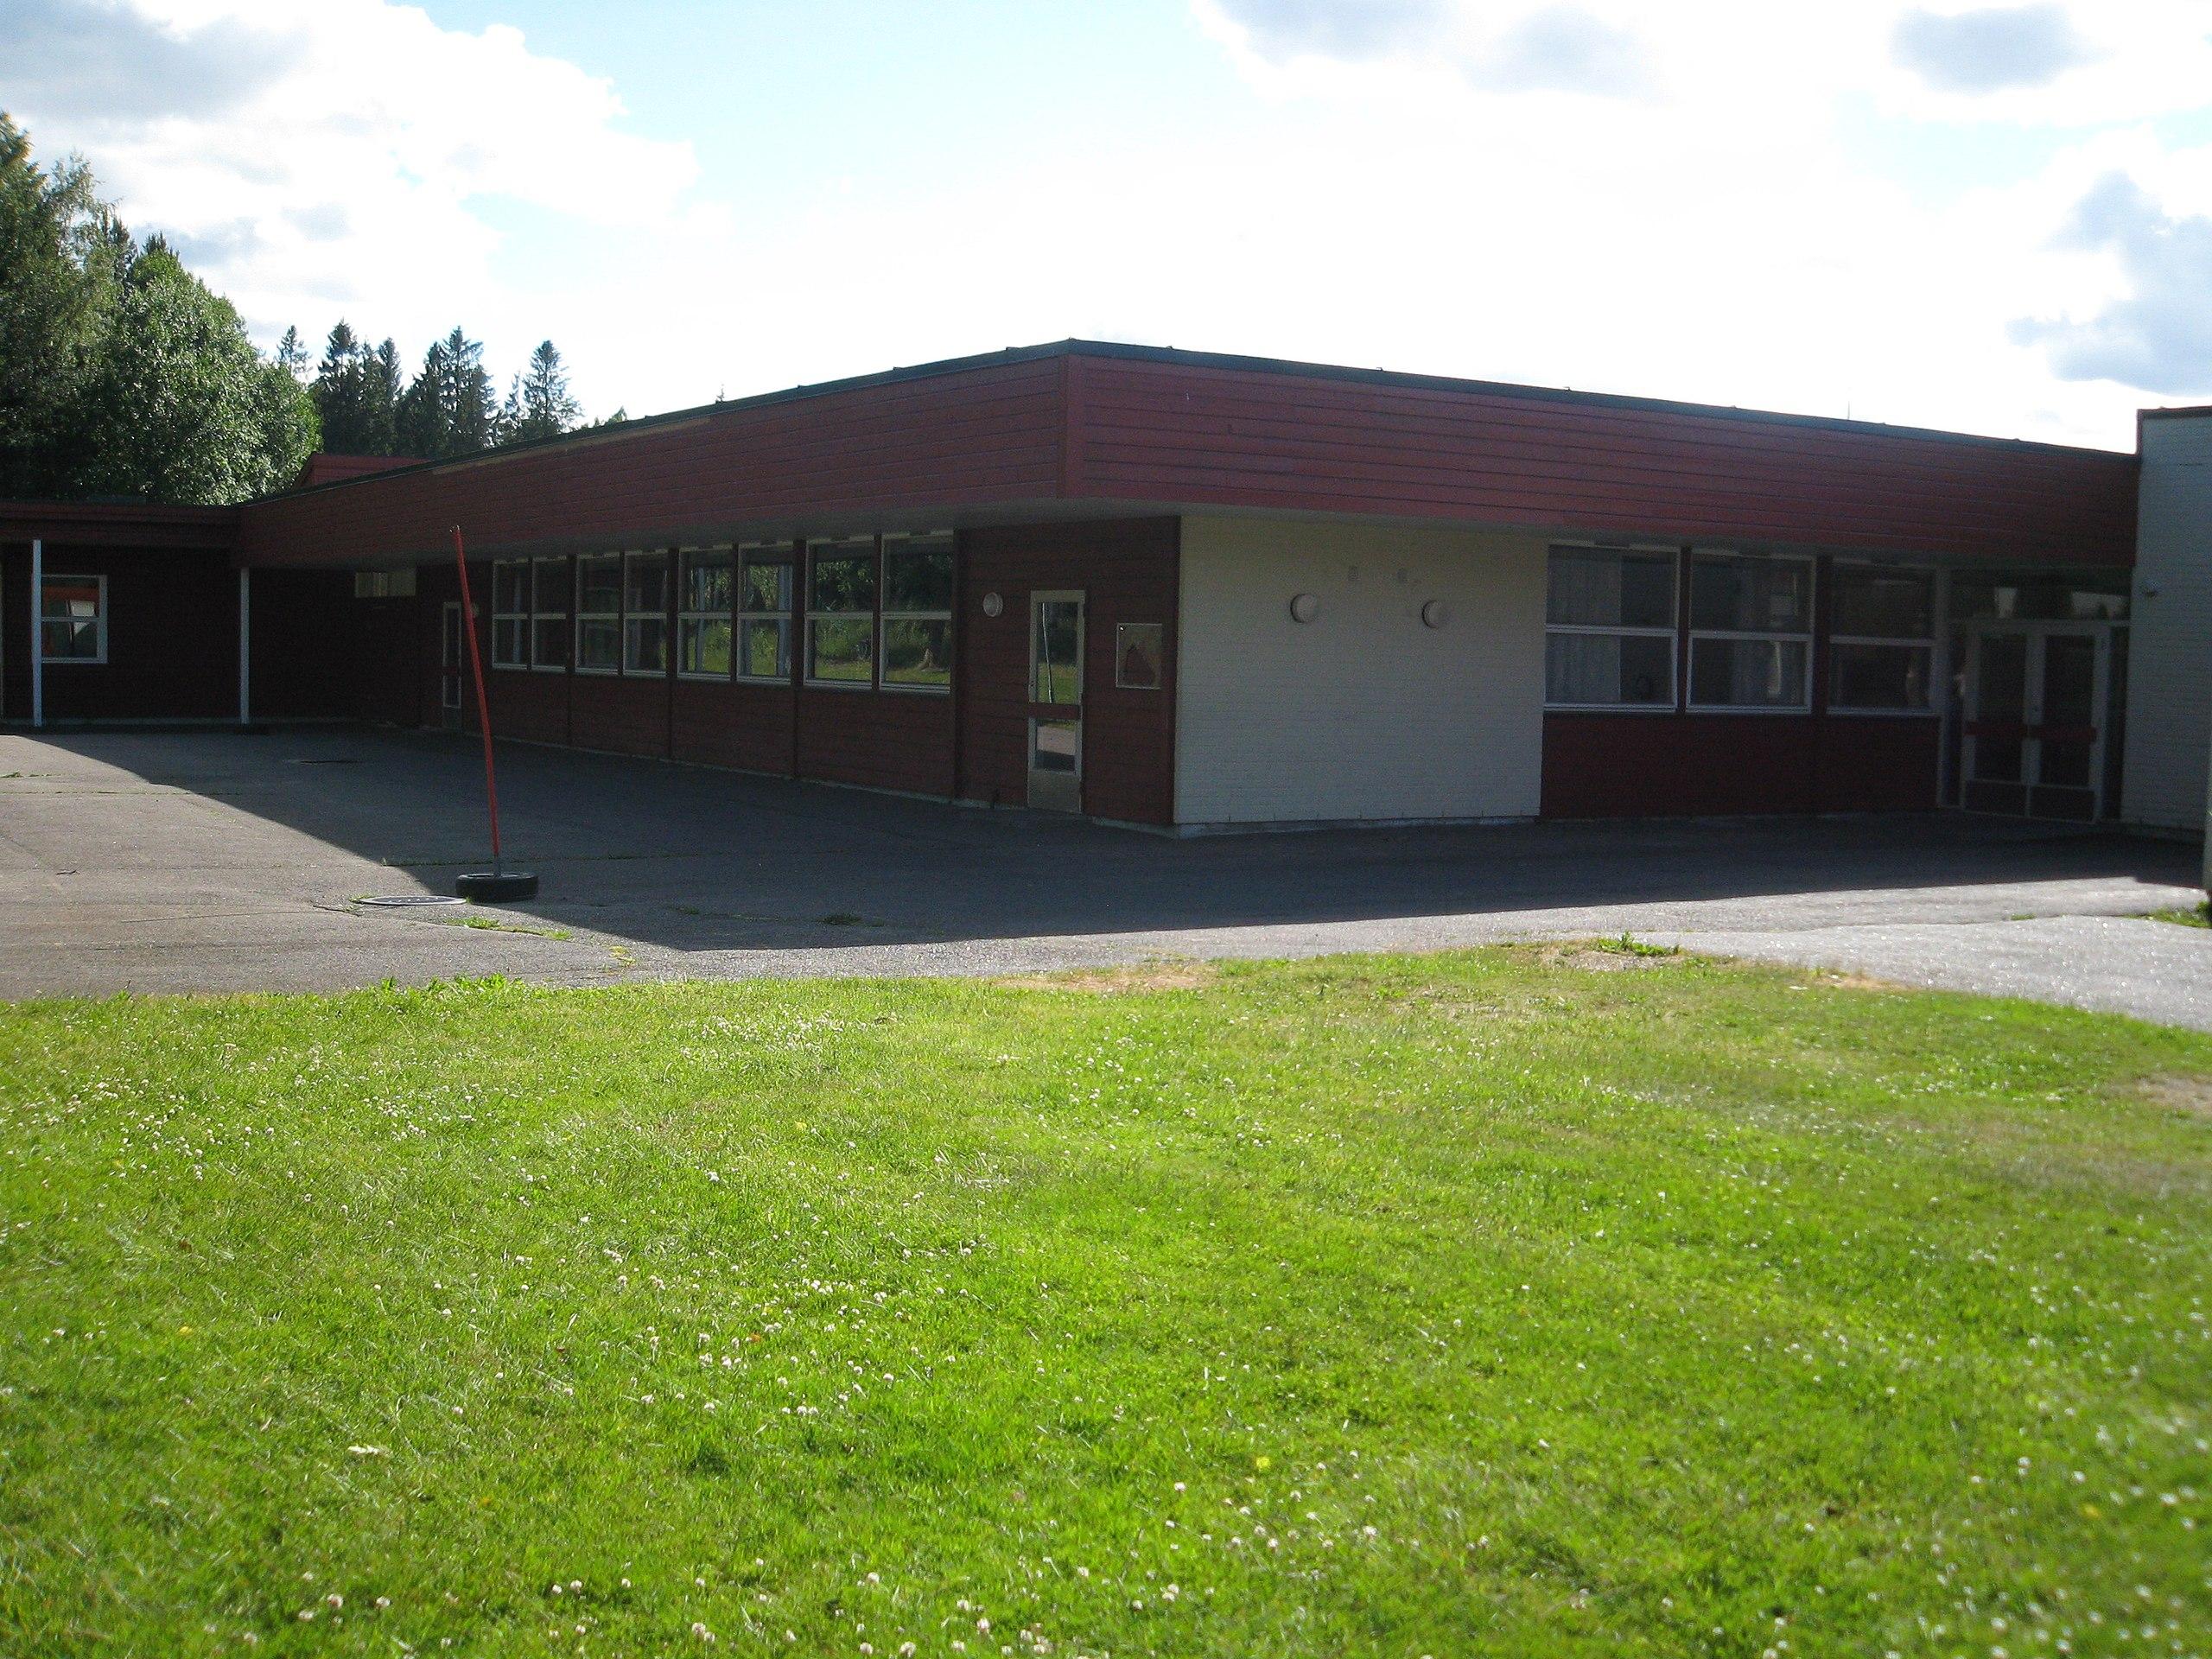 File:Barkåker chambersunion.com - Wikimedia Commons